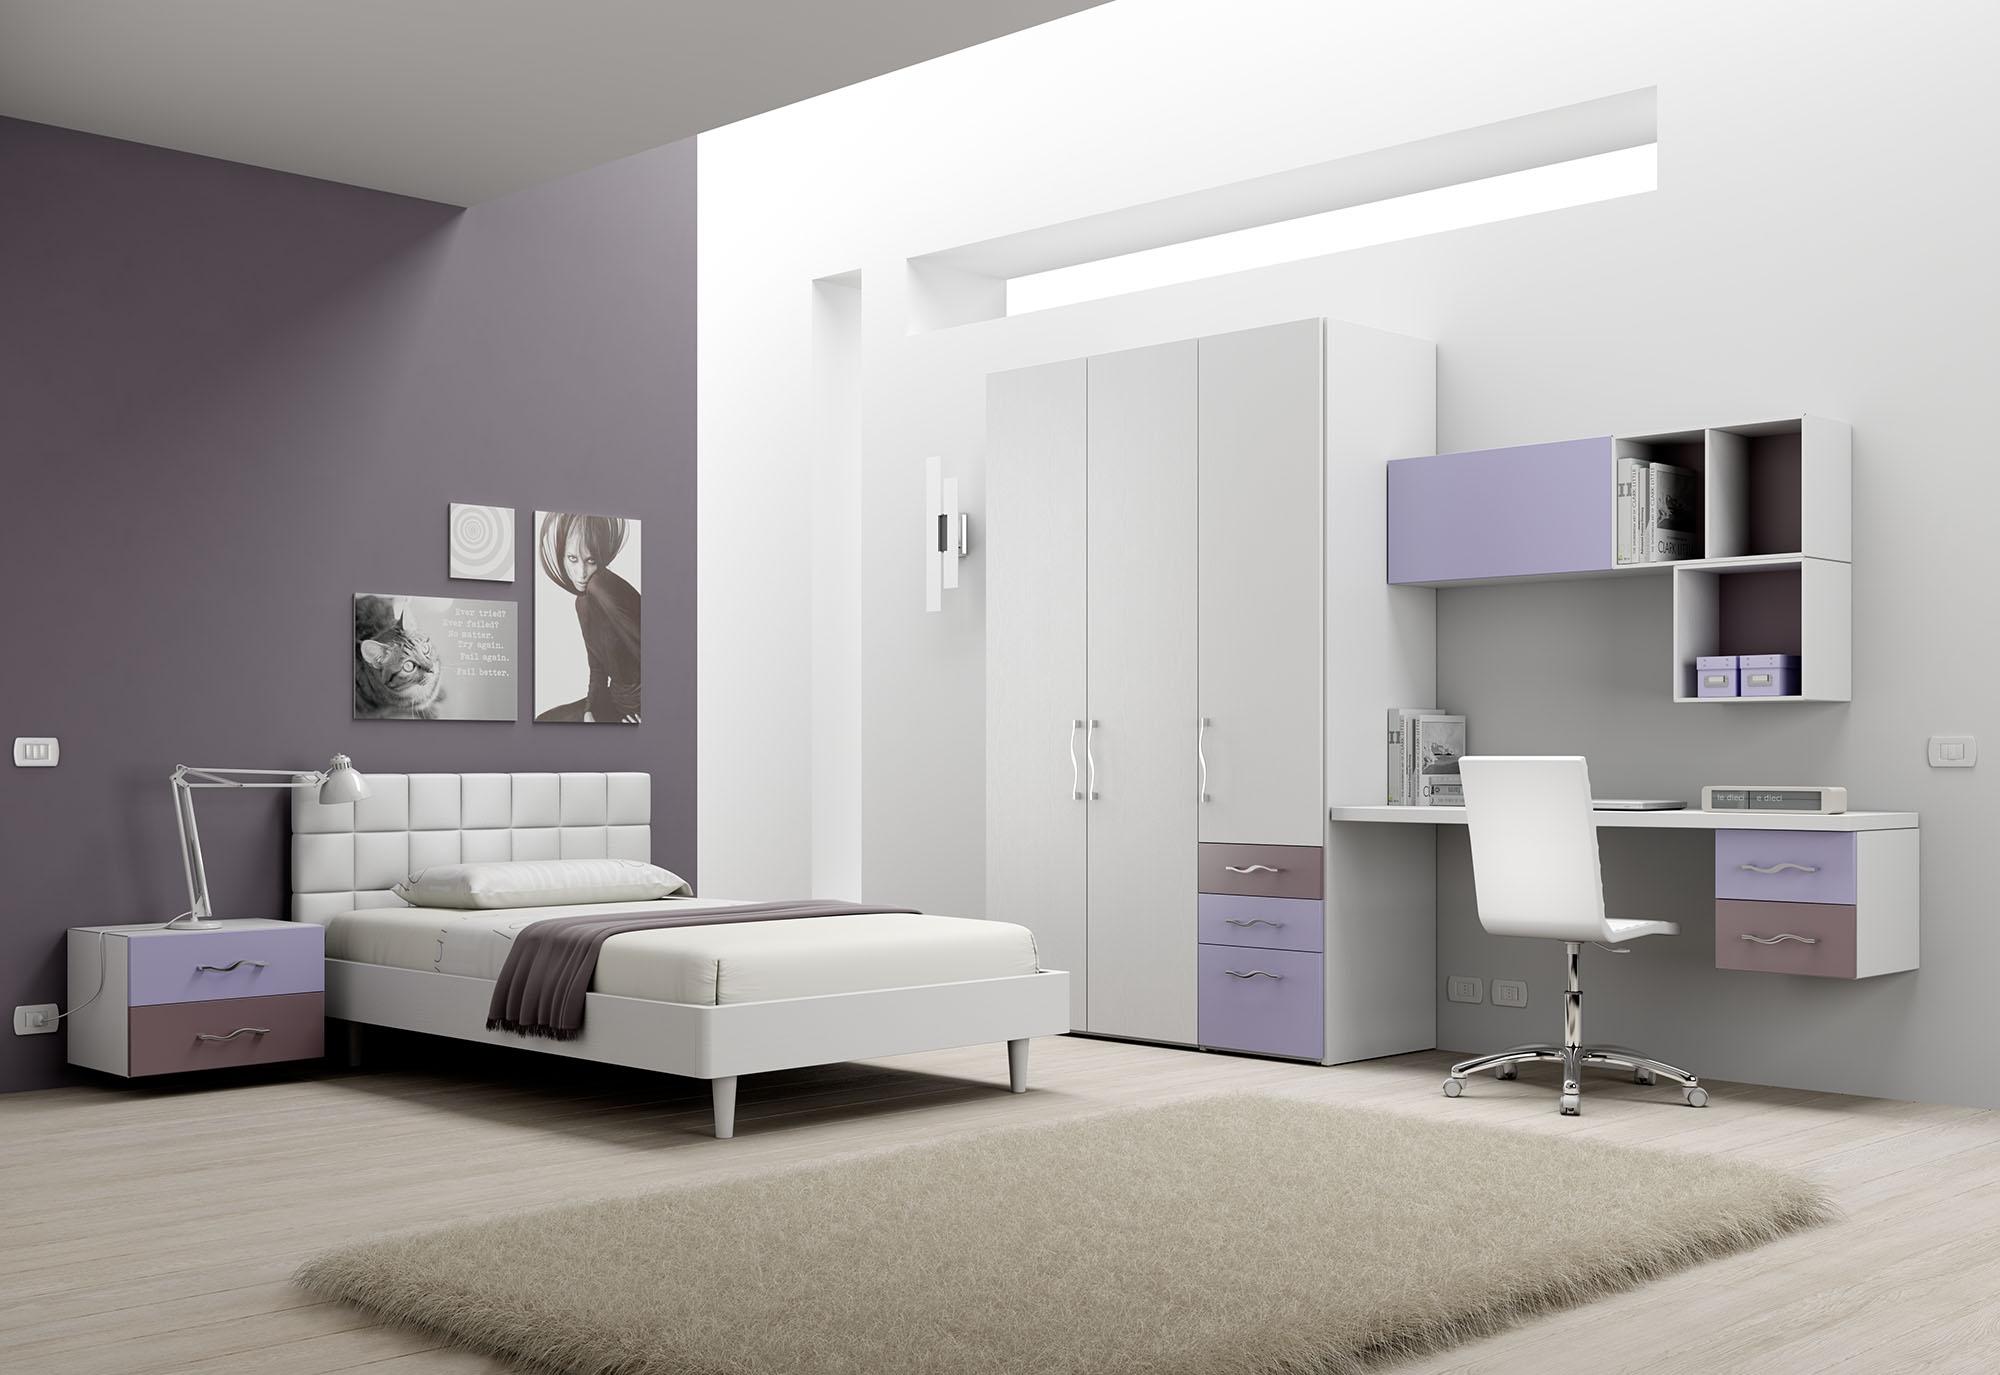 Chambre enfant PERSONNALISABLE BF36 avec lit ado - MORETTI COMPACT